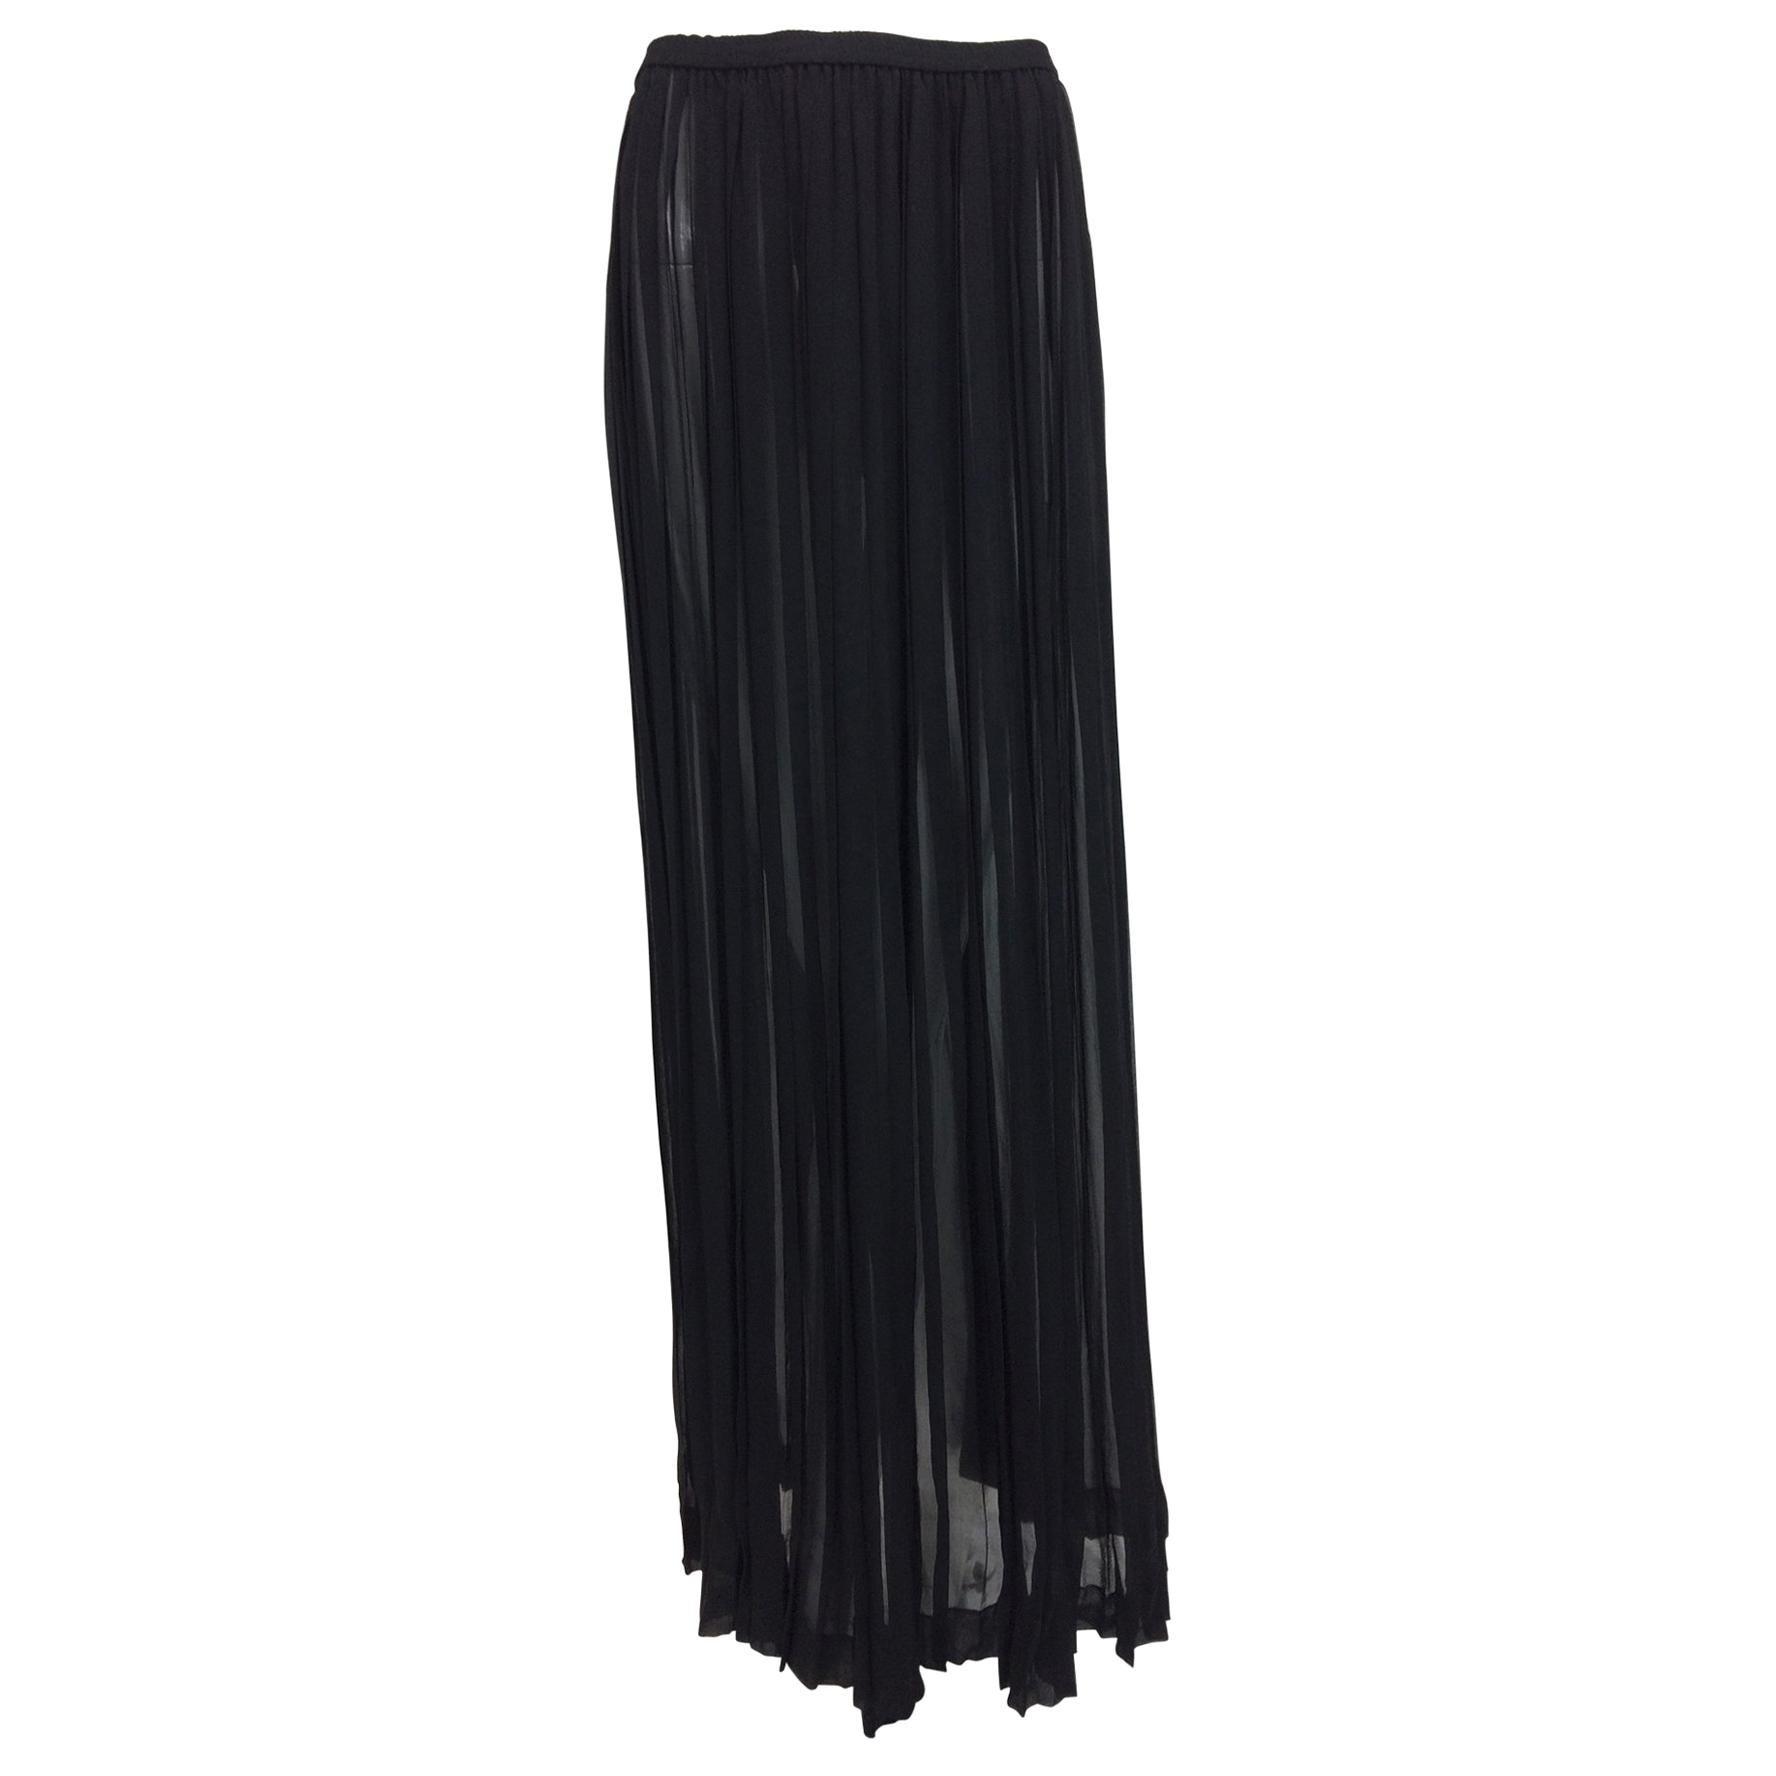 Yves Saint Laurent Black Silk Chiffon Knife Pleated Maxi Skirt Vintage 1970s